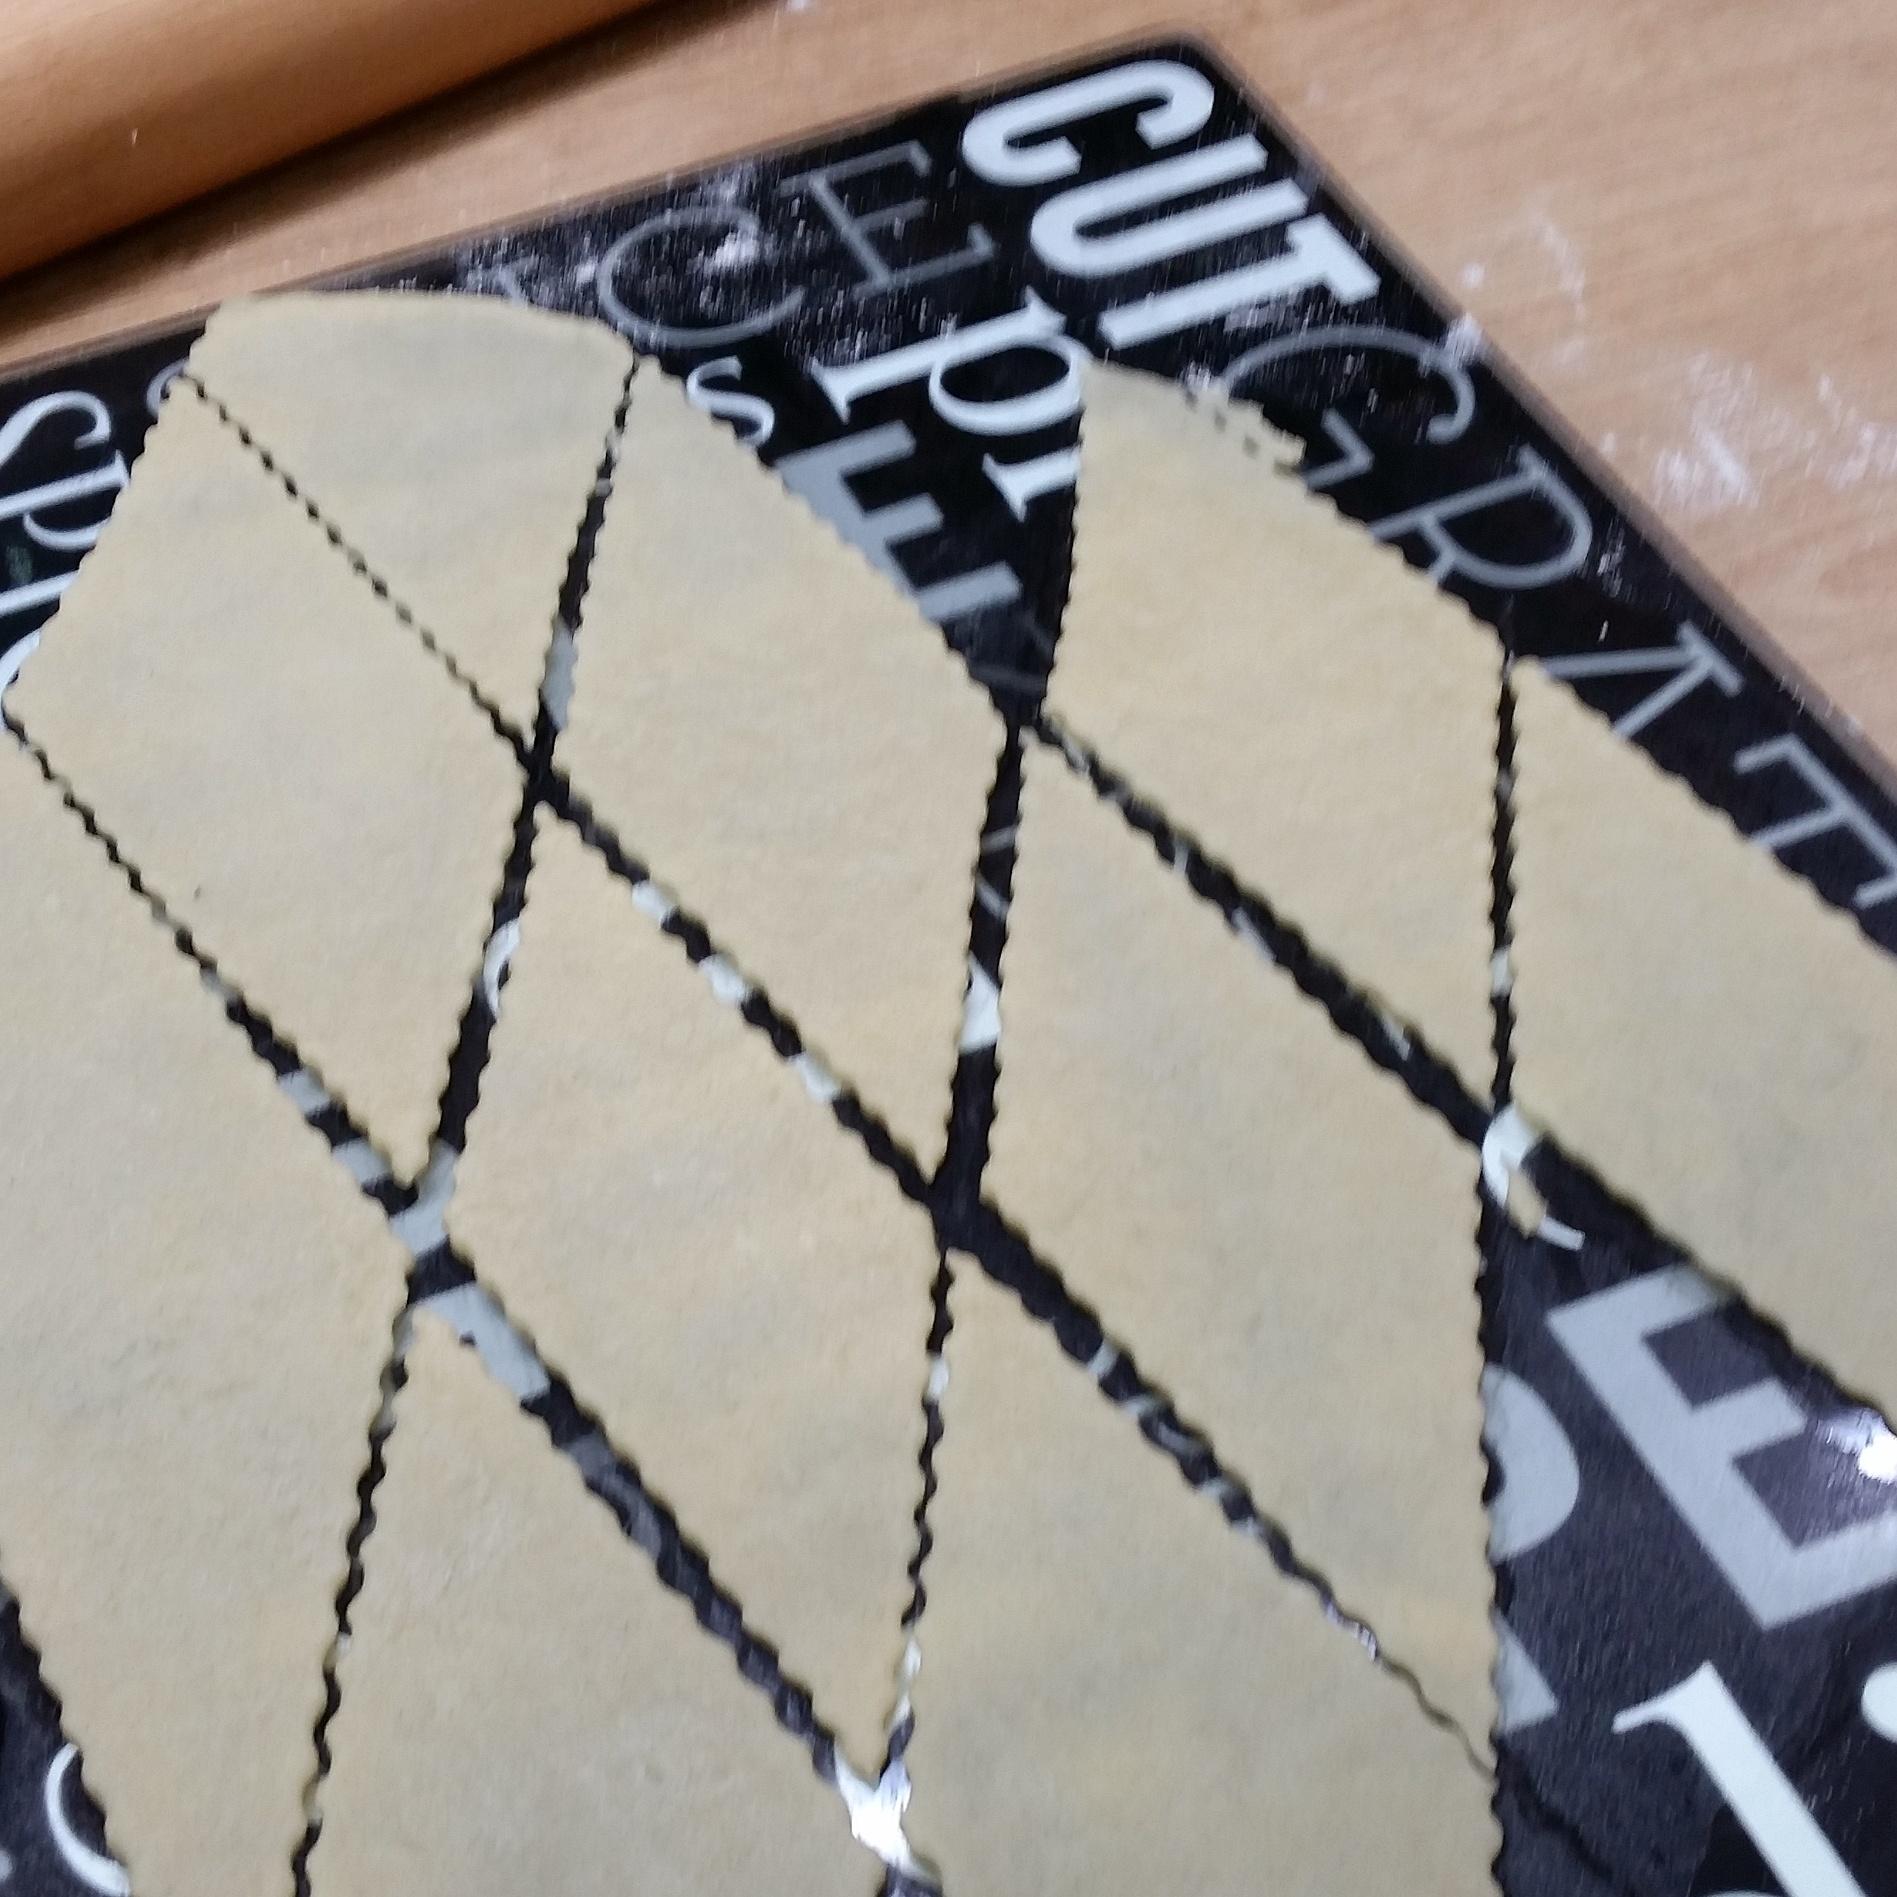 Borrachuelos being cut into diamond shapes